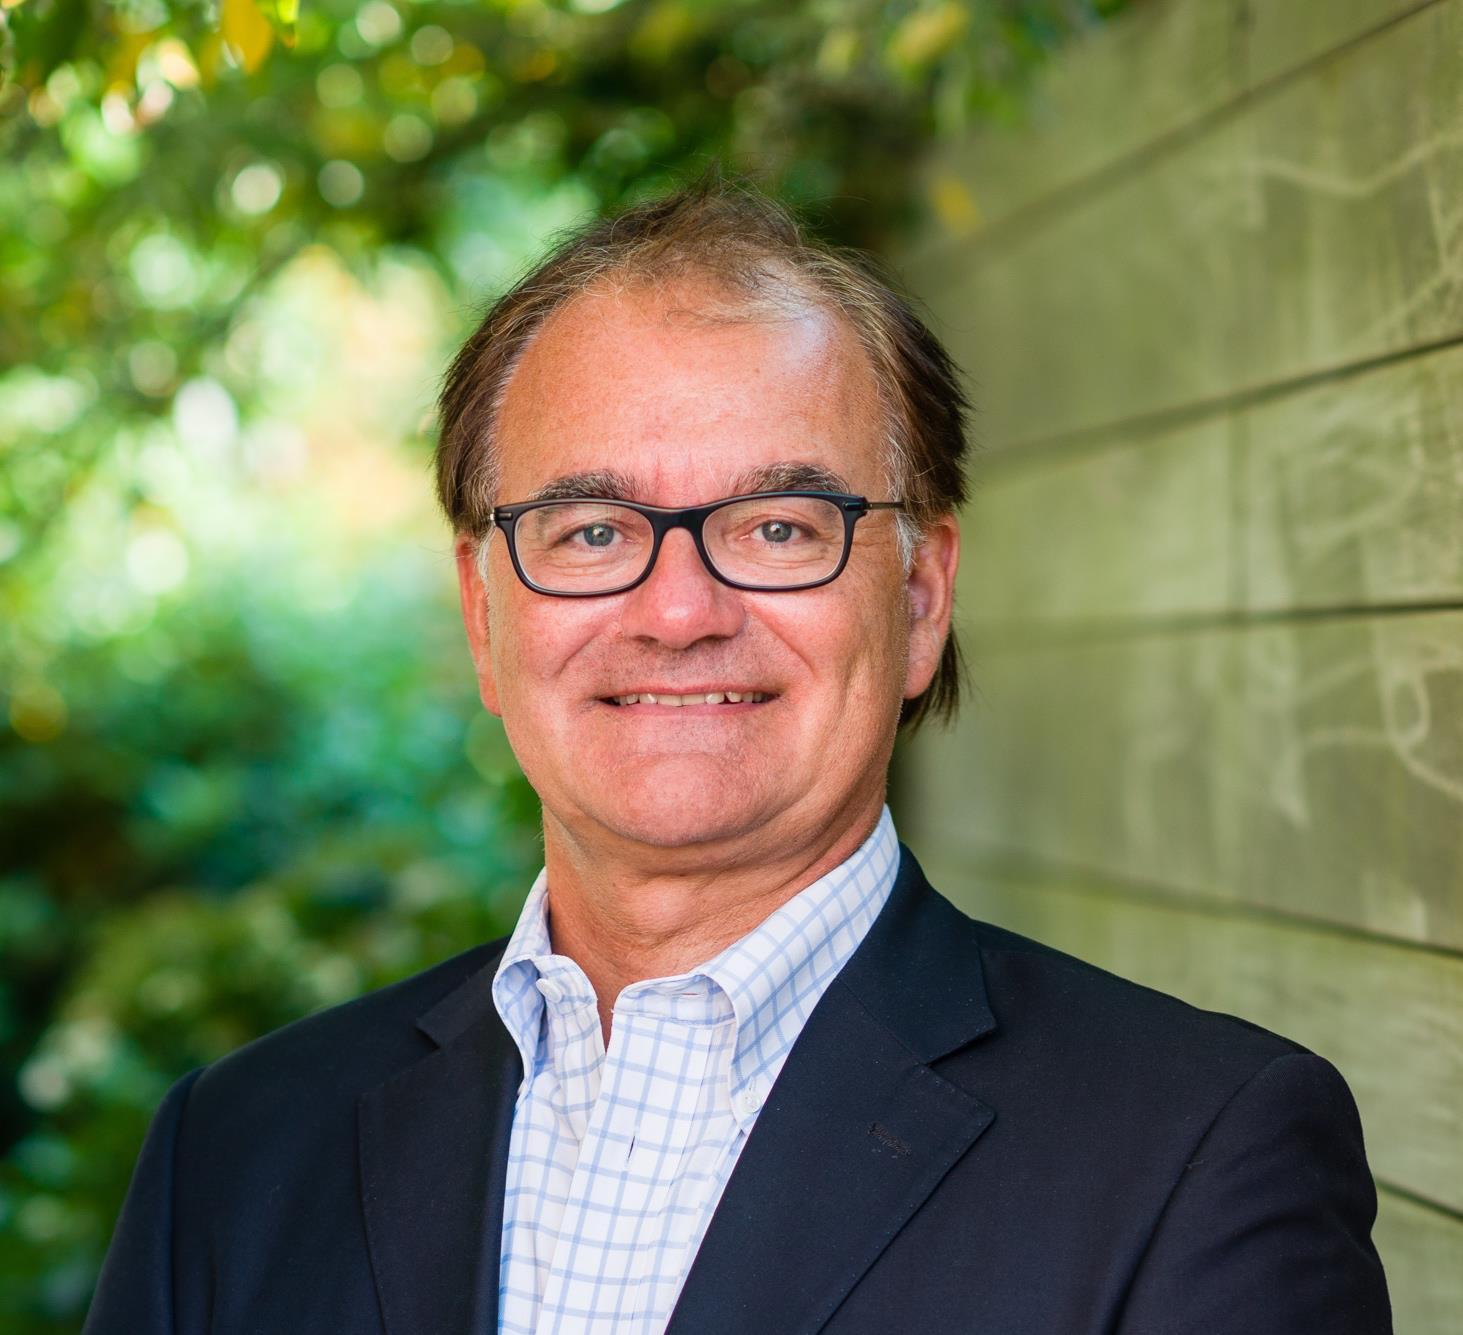 Thierry Van Landegem to Lead Inaugural IIoT Cohort of mHUB Accelerator Program